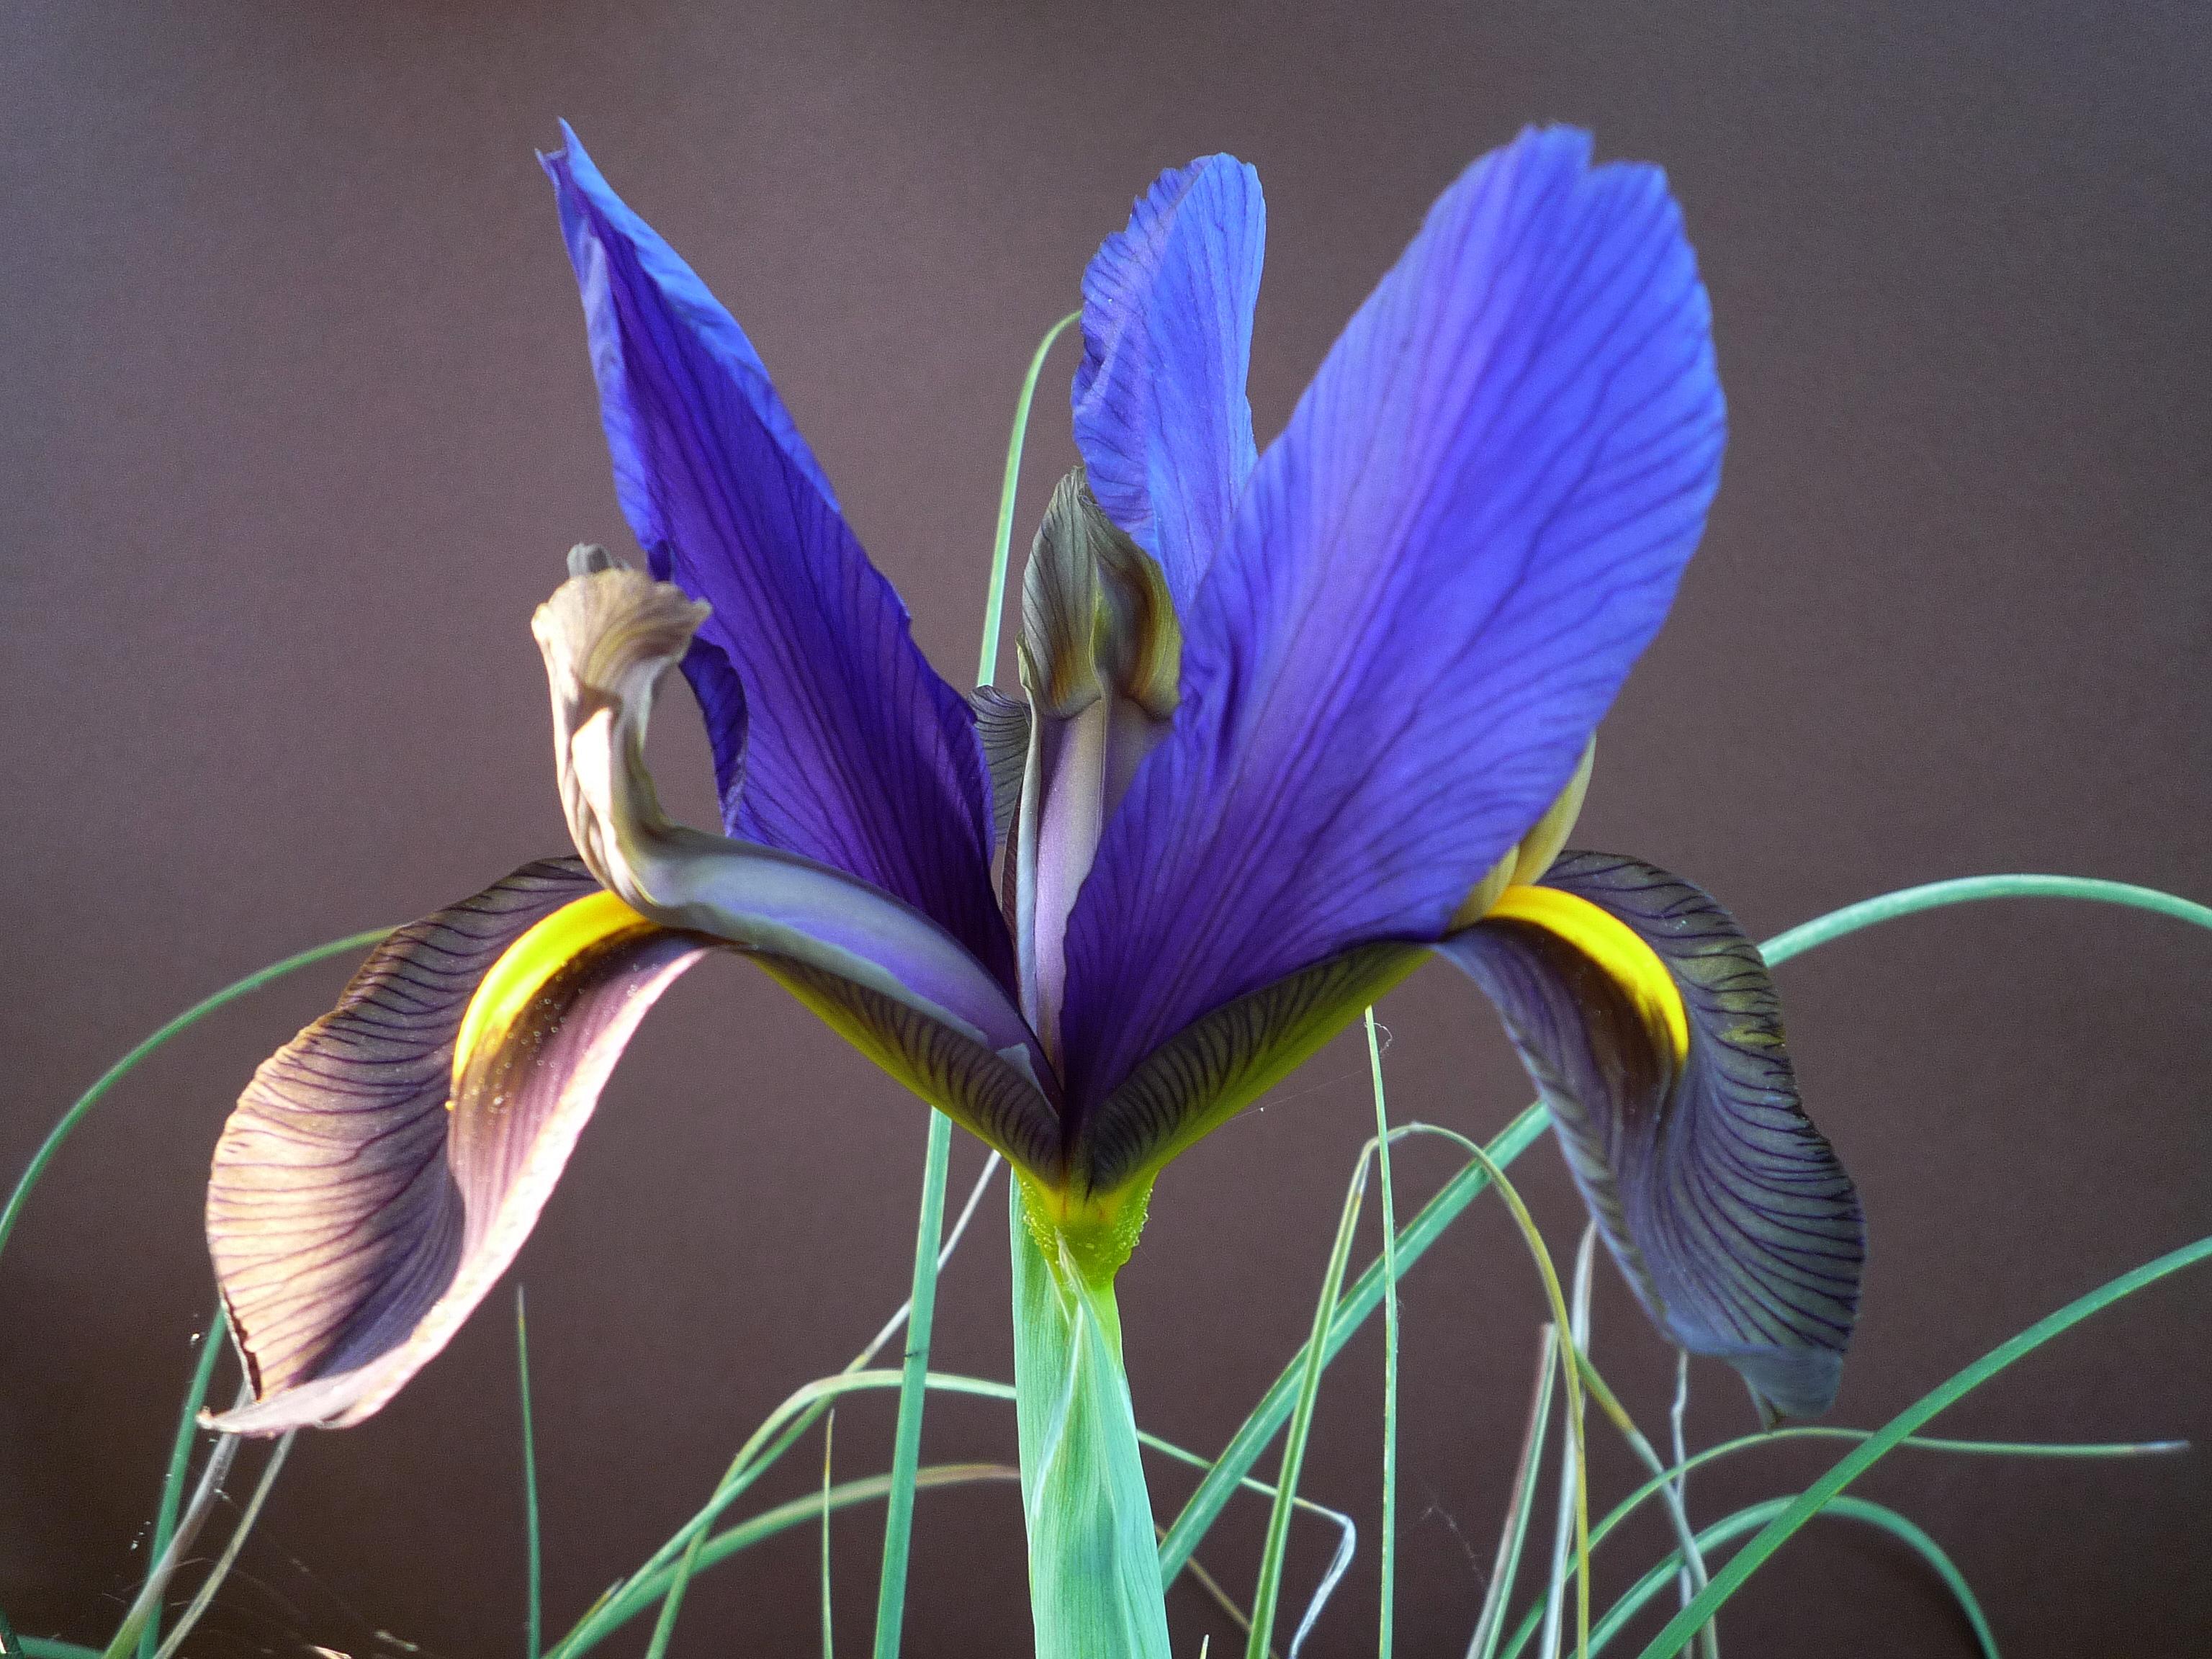 Hintergrundbilder : Blumen, Iris, Blume, Makro, verlassen, Natur ...